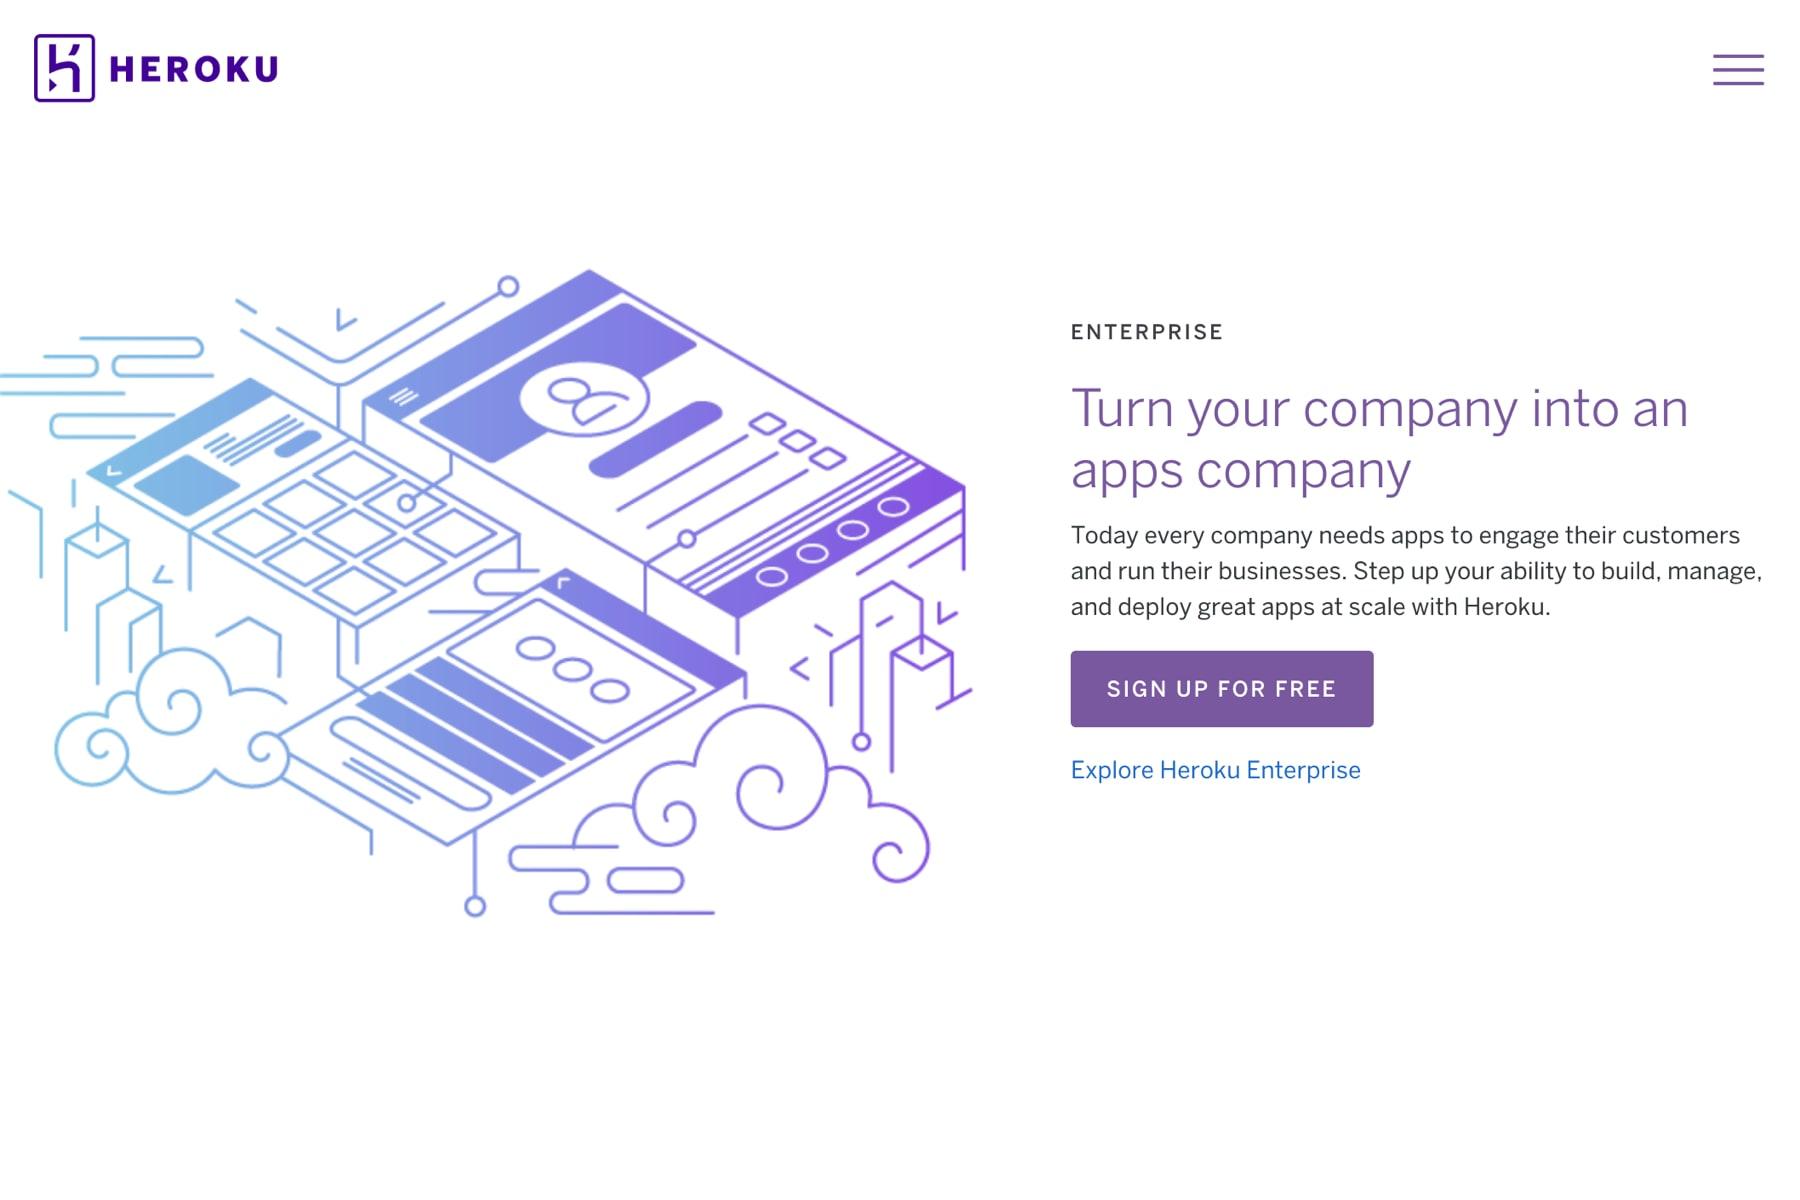 Cloud application platform